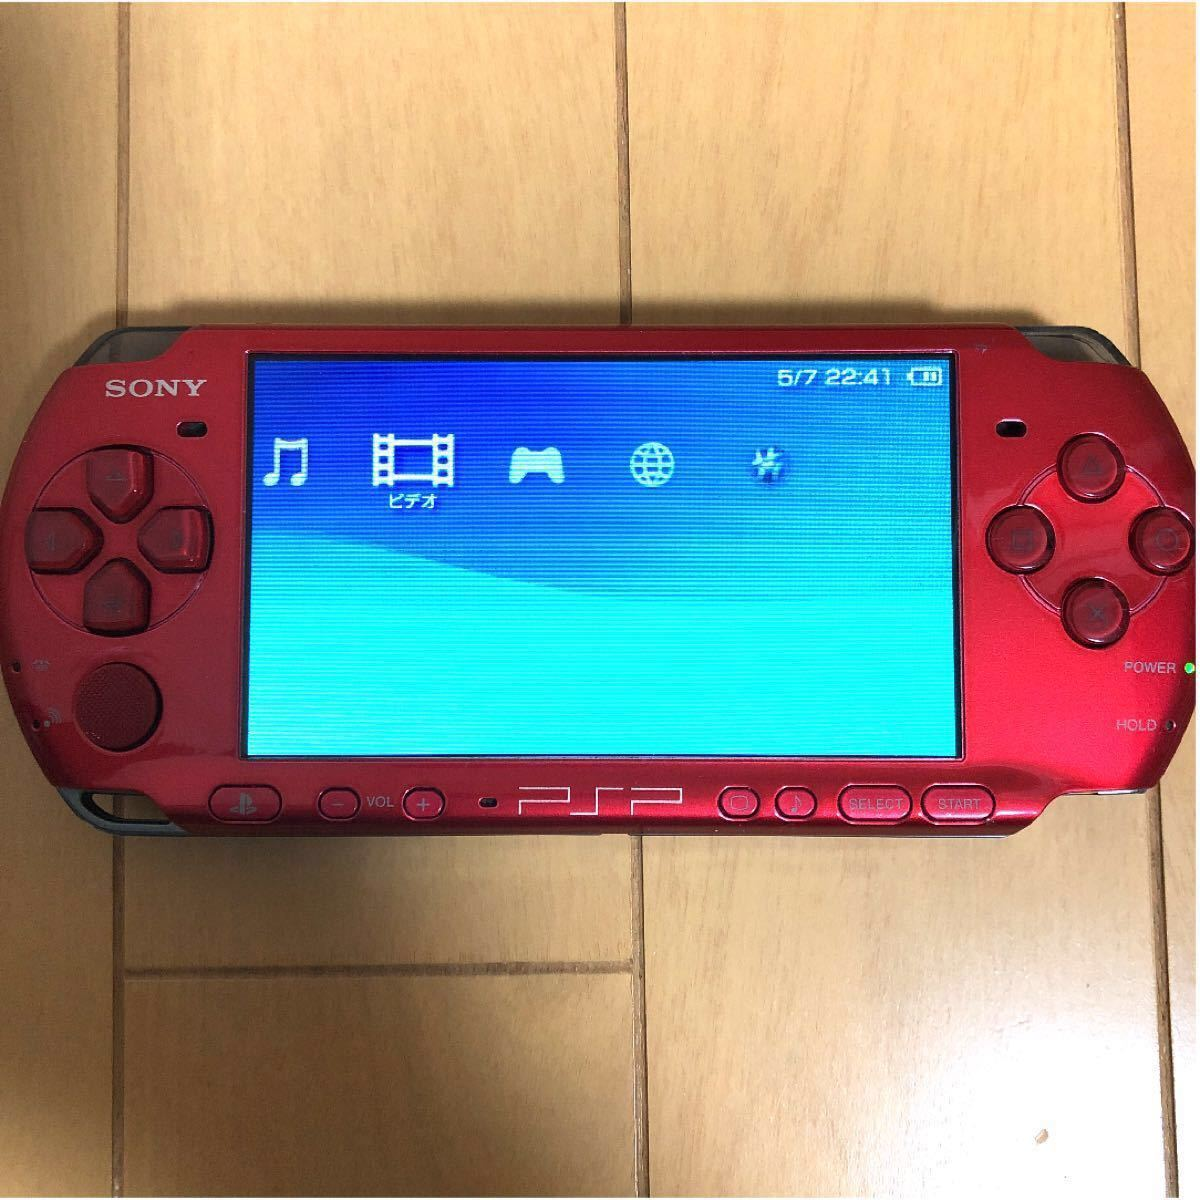 SONY PlayStationPortable PSP-3000MS おまけ付き